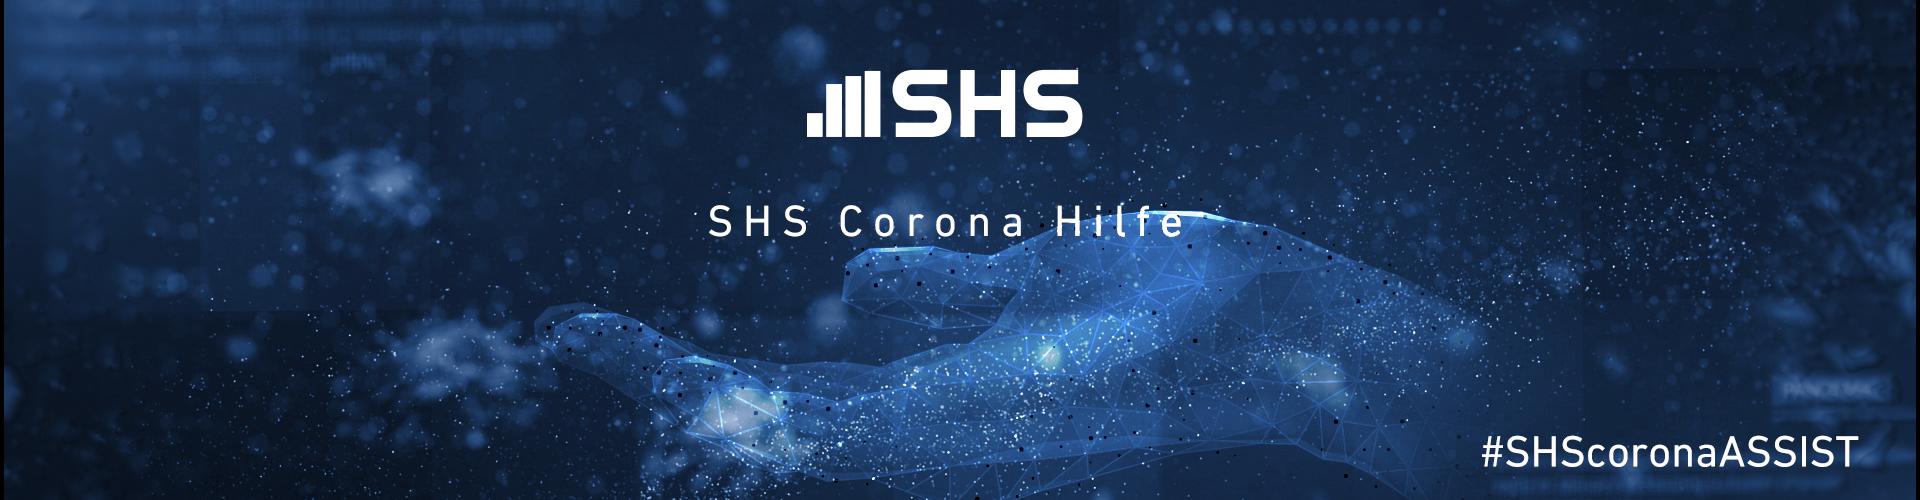 SHS Corona Hilfe SHScoronaASSIST